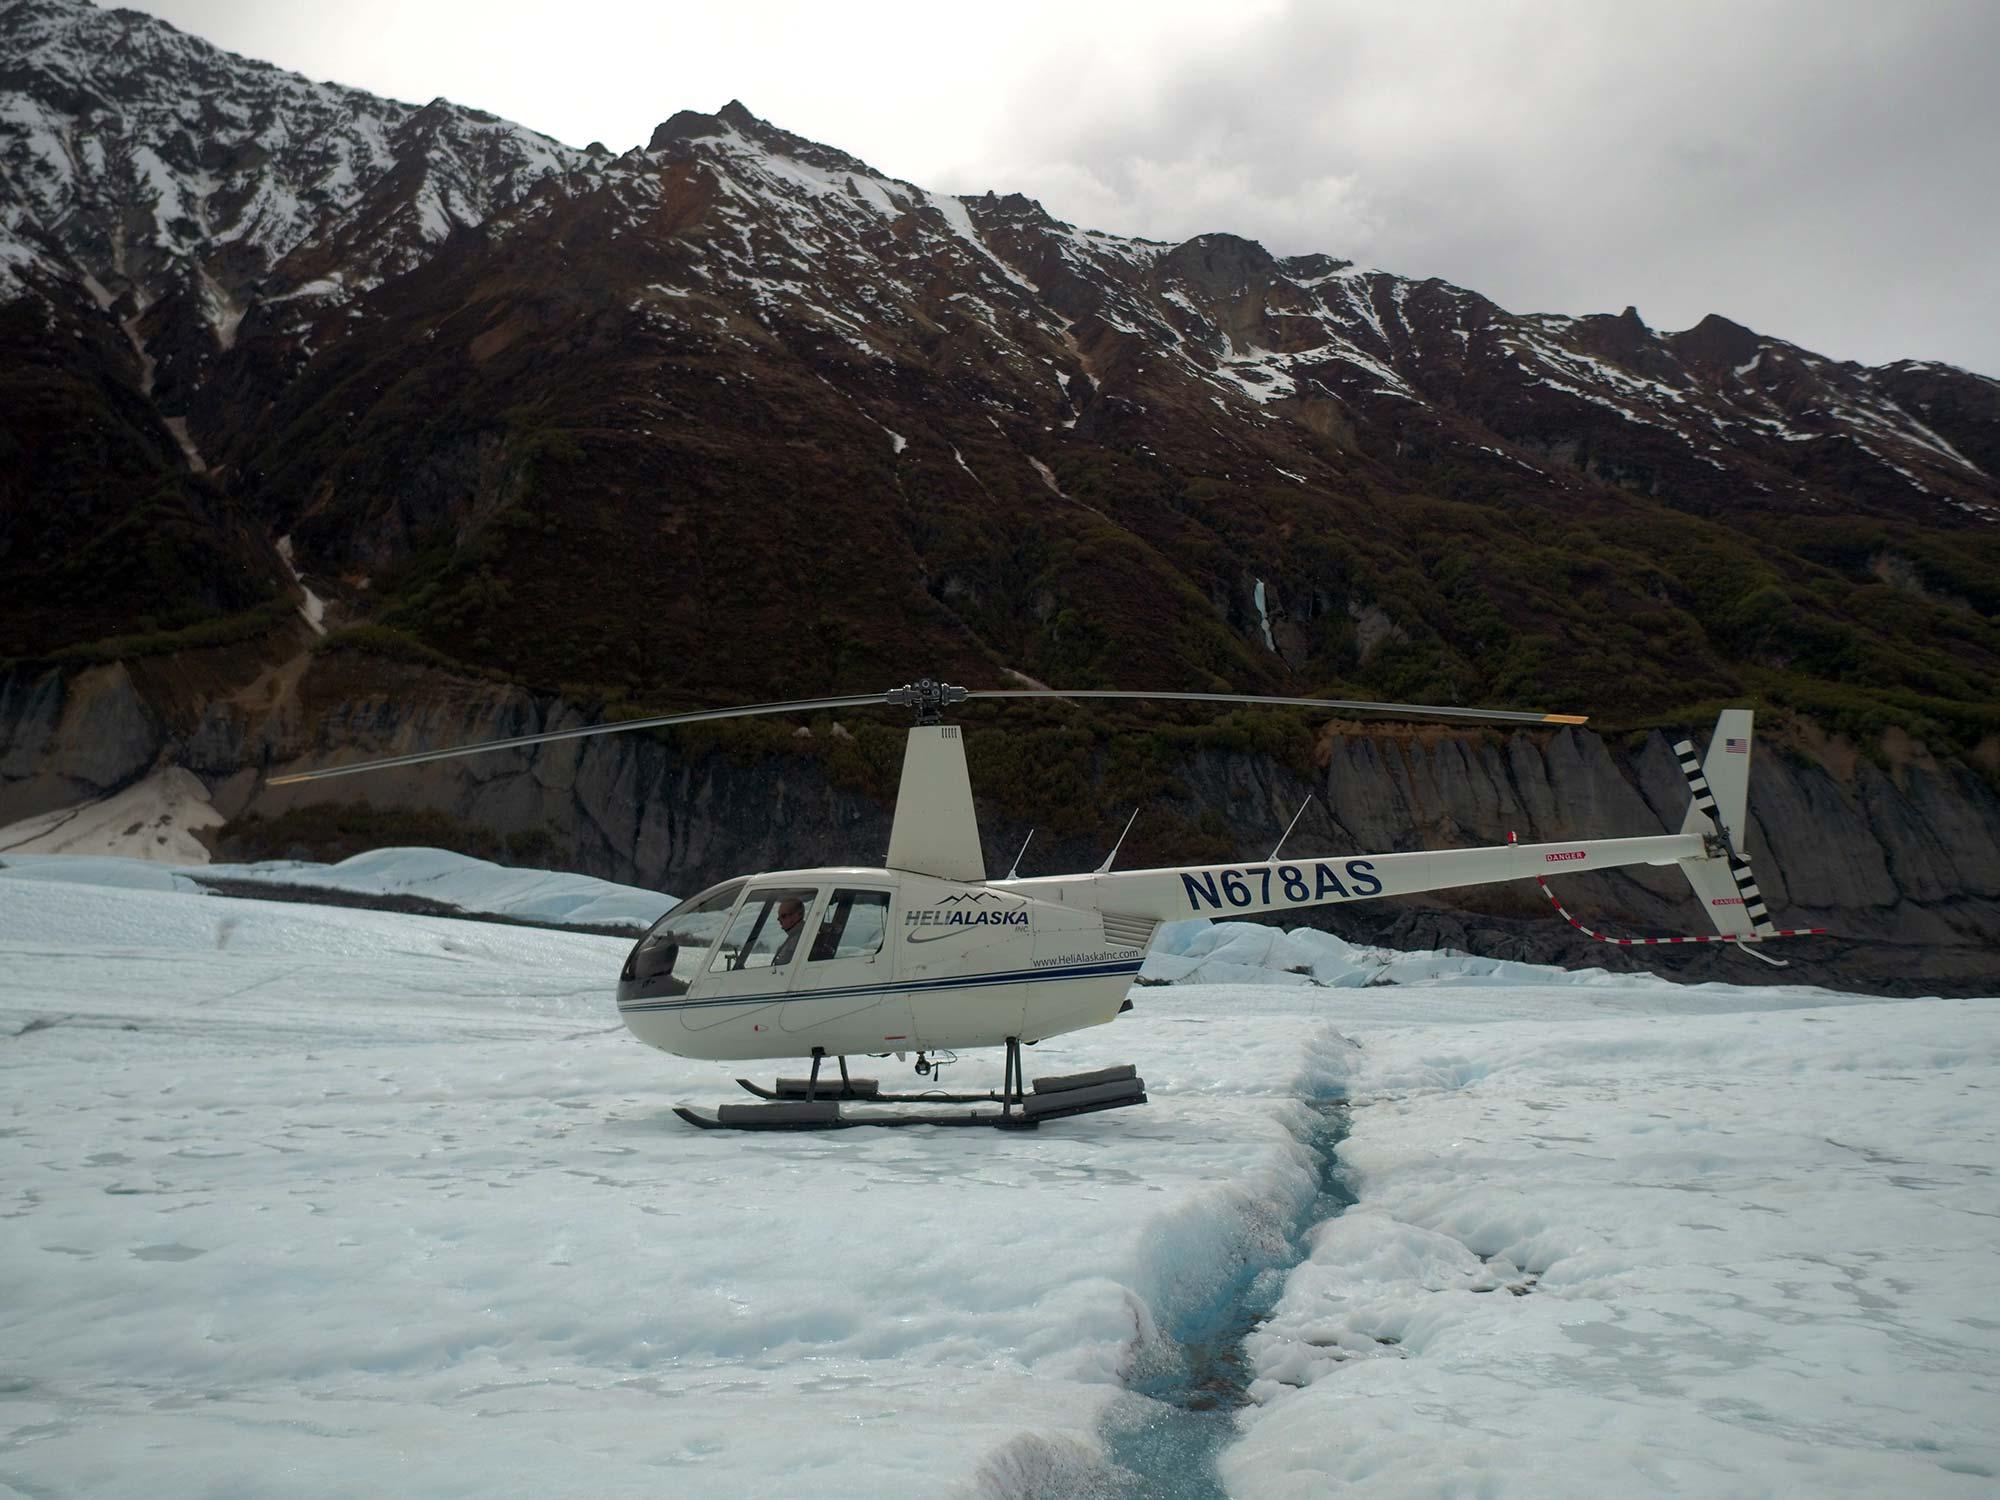 Helicopter on Glacier River